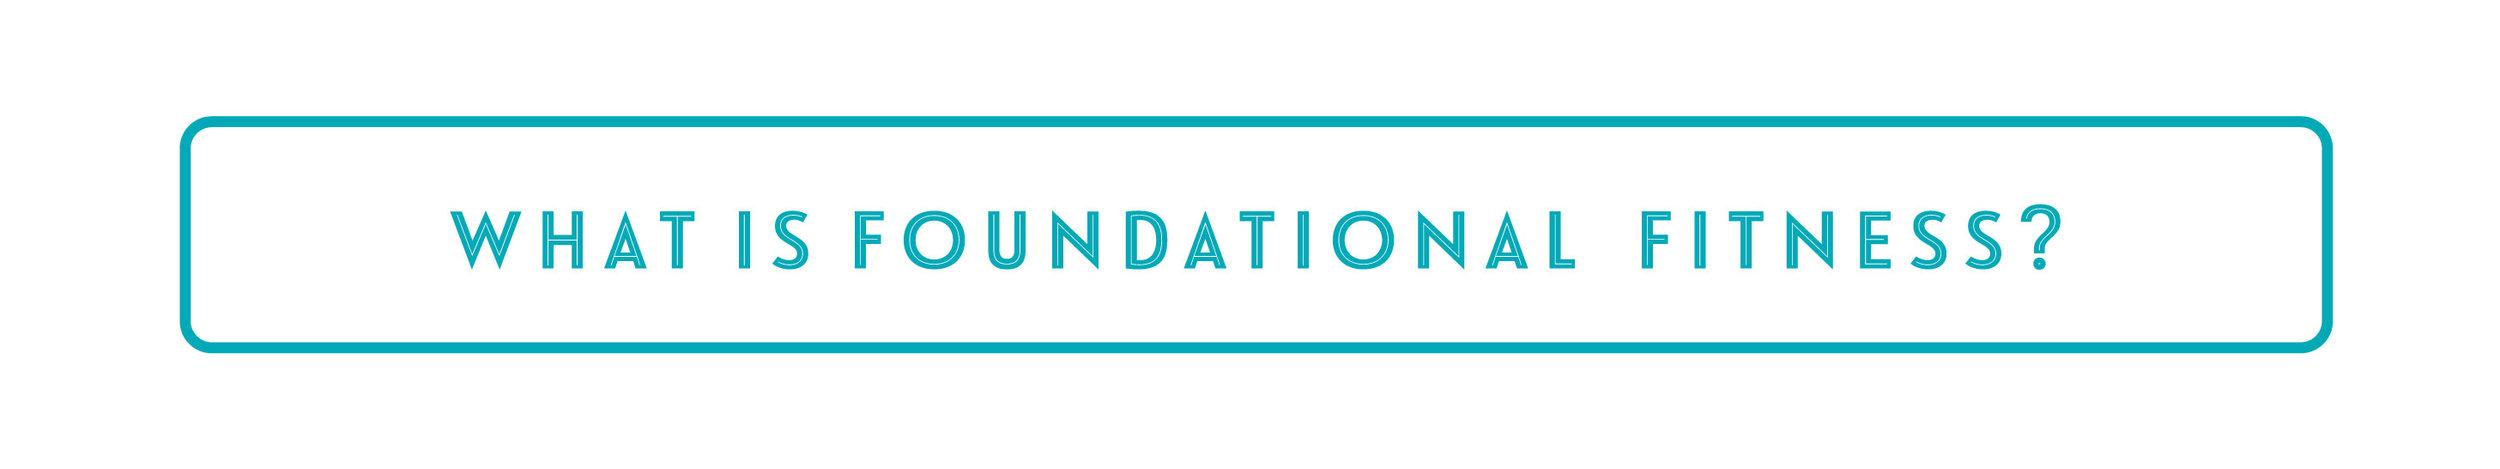 foundational-fitness-button.jpg